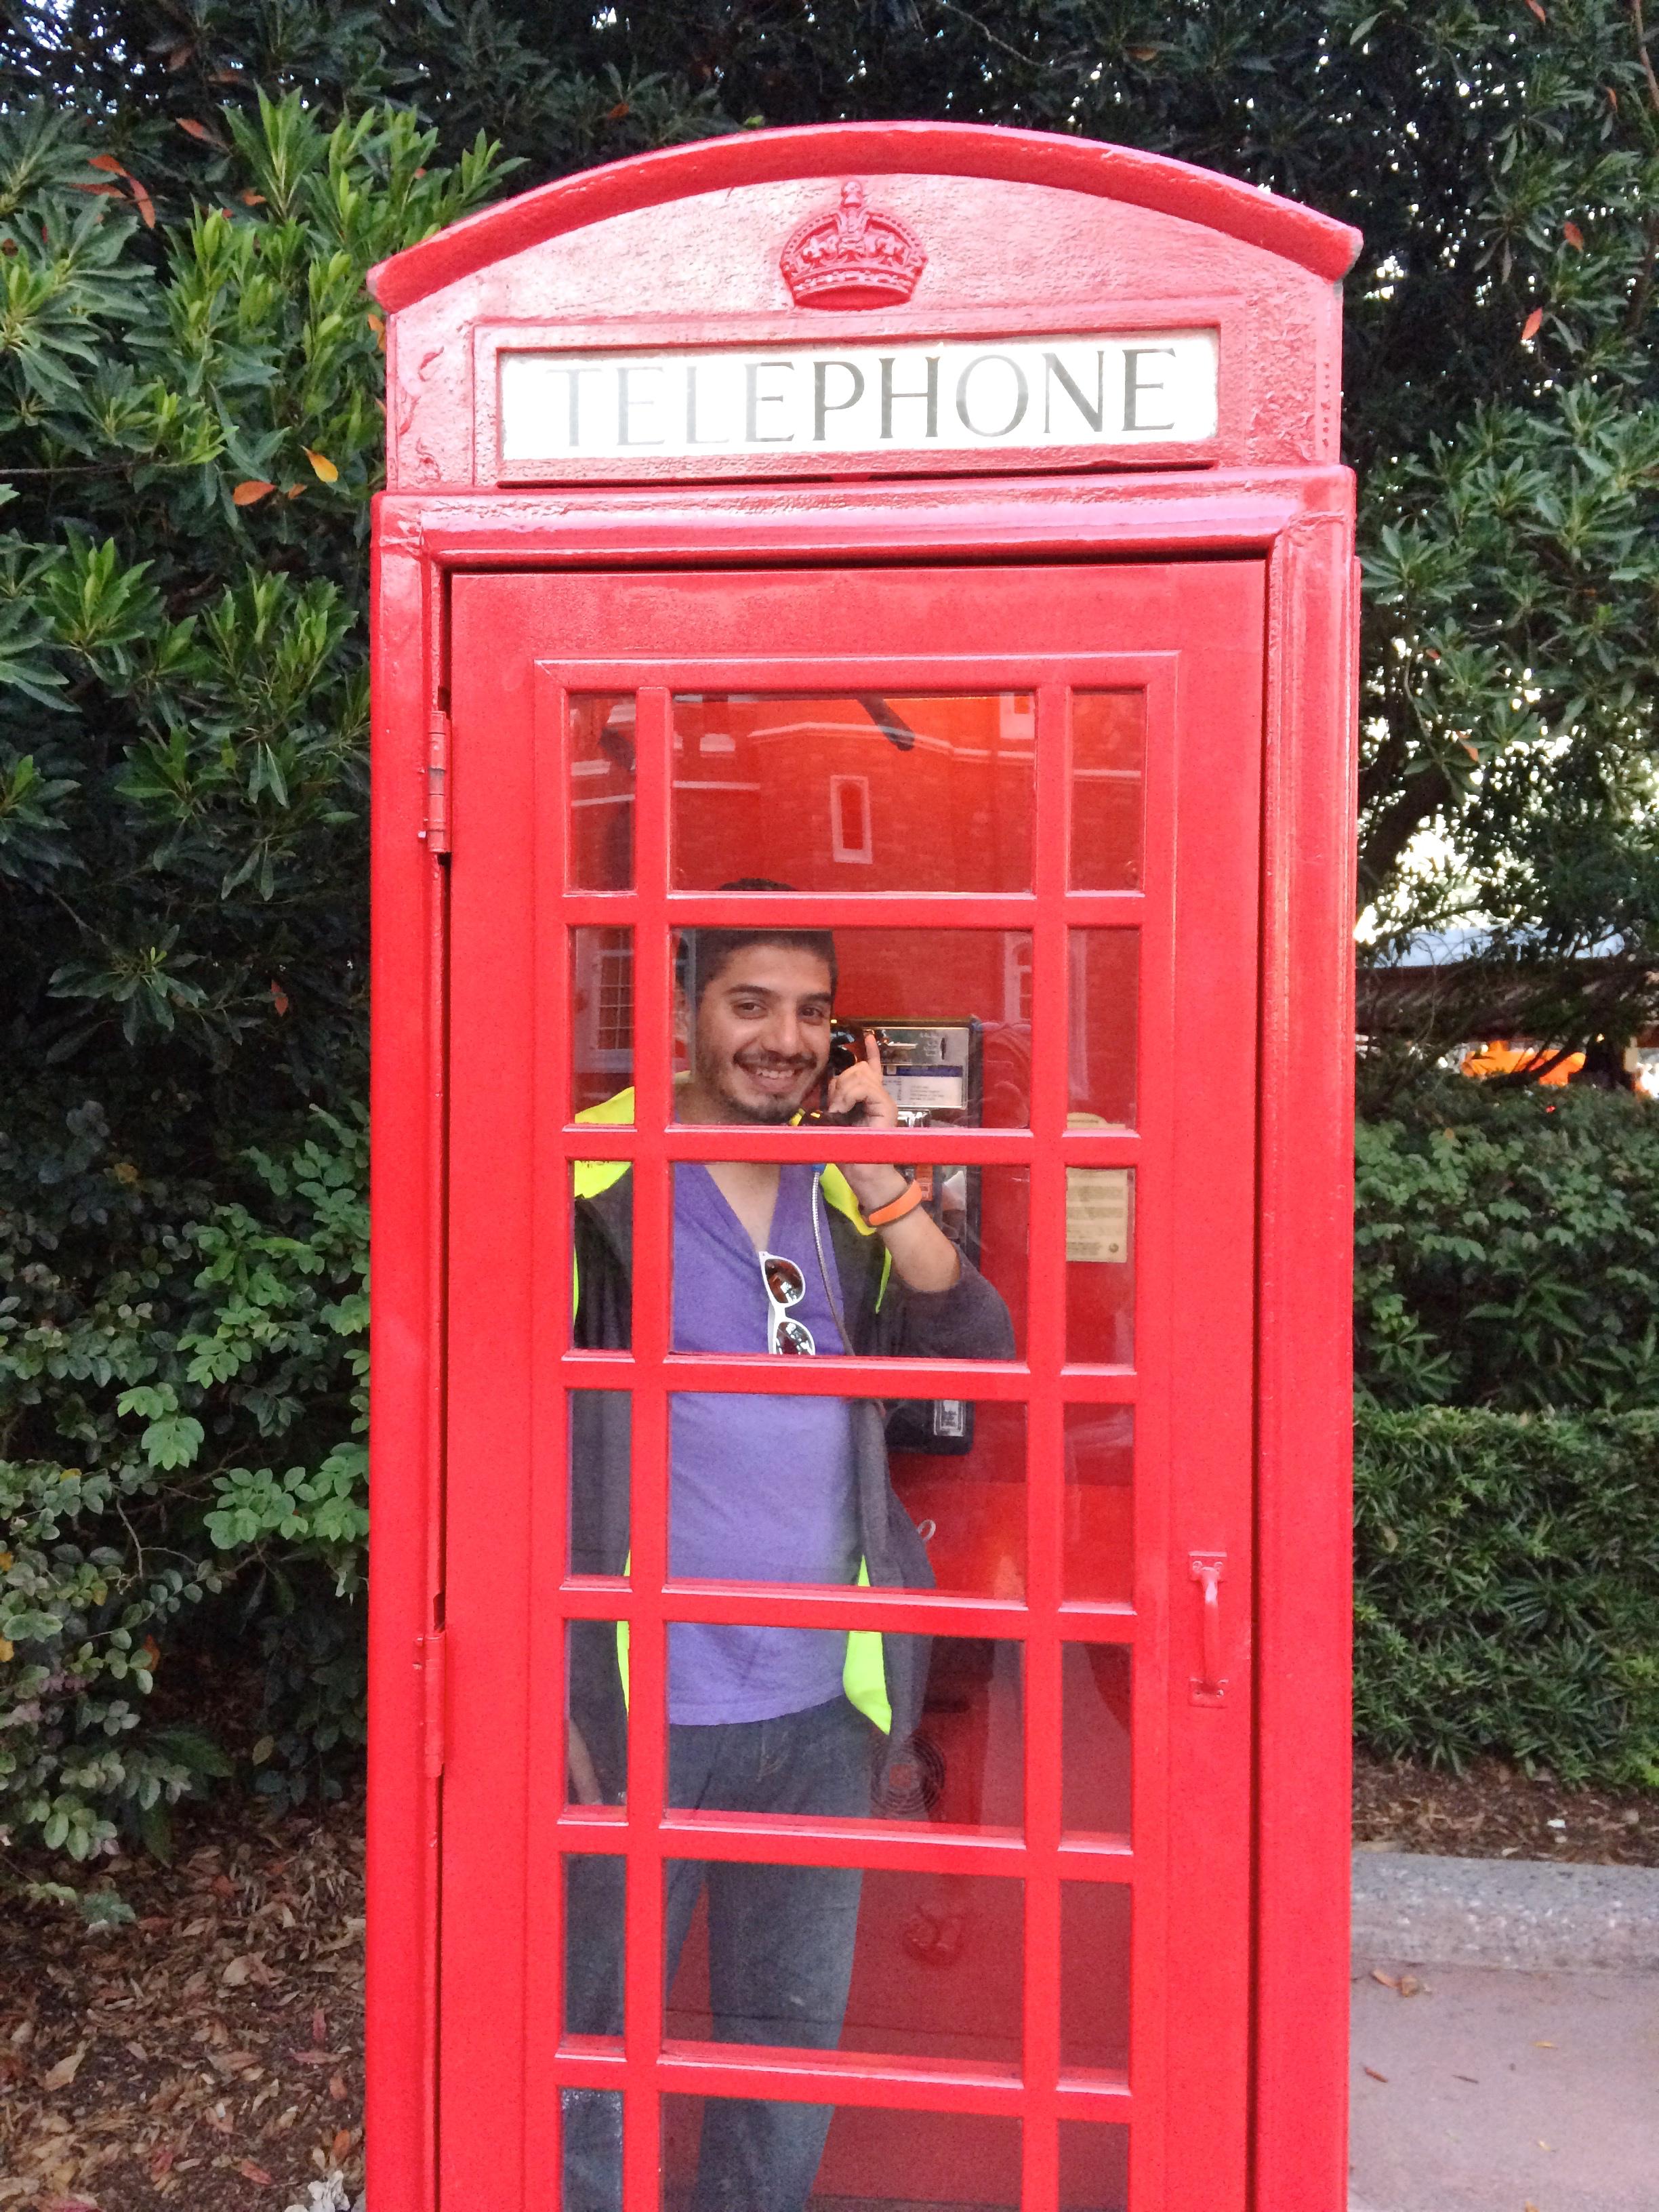 united-kingdom-epcot-phone-booth.jpg